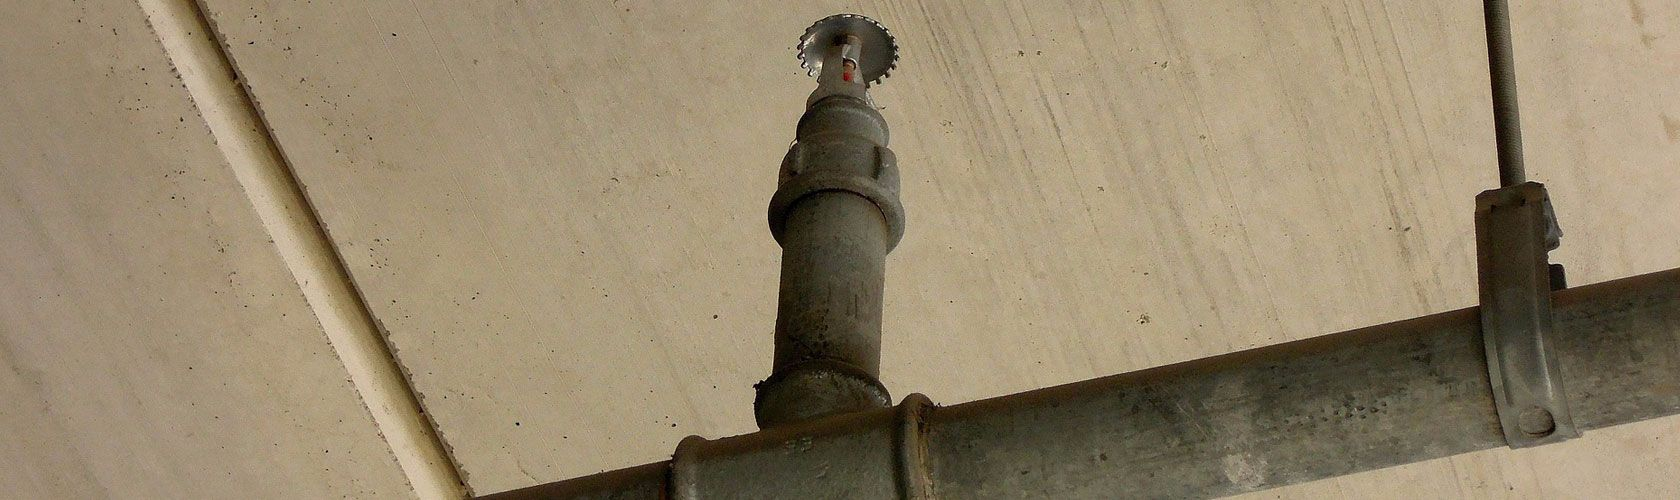 Wartung Brandmeldeanlage Sprinklersystem Hannover